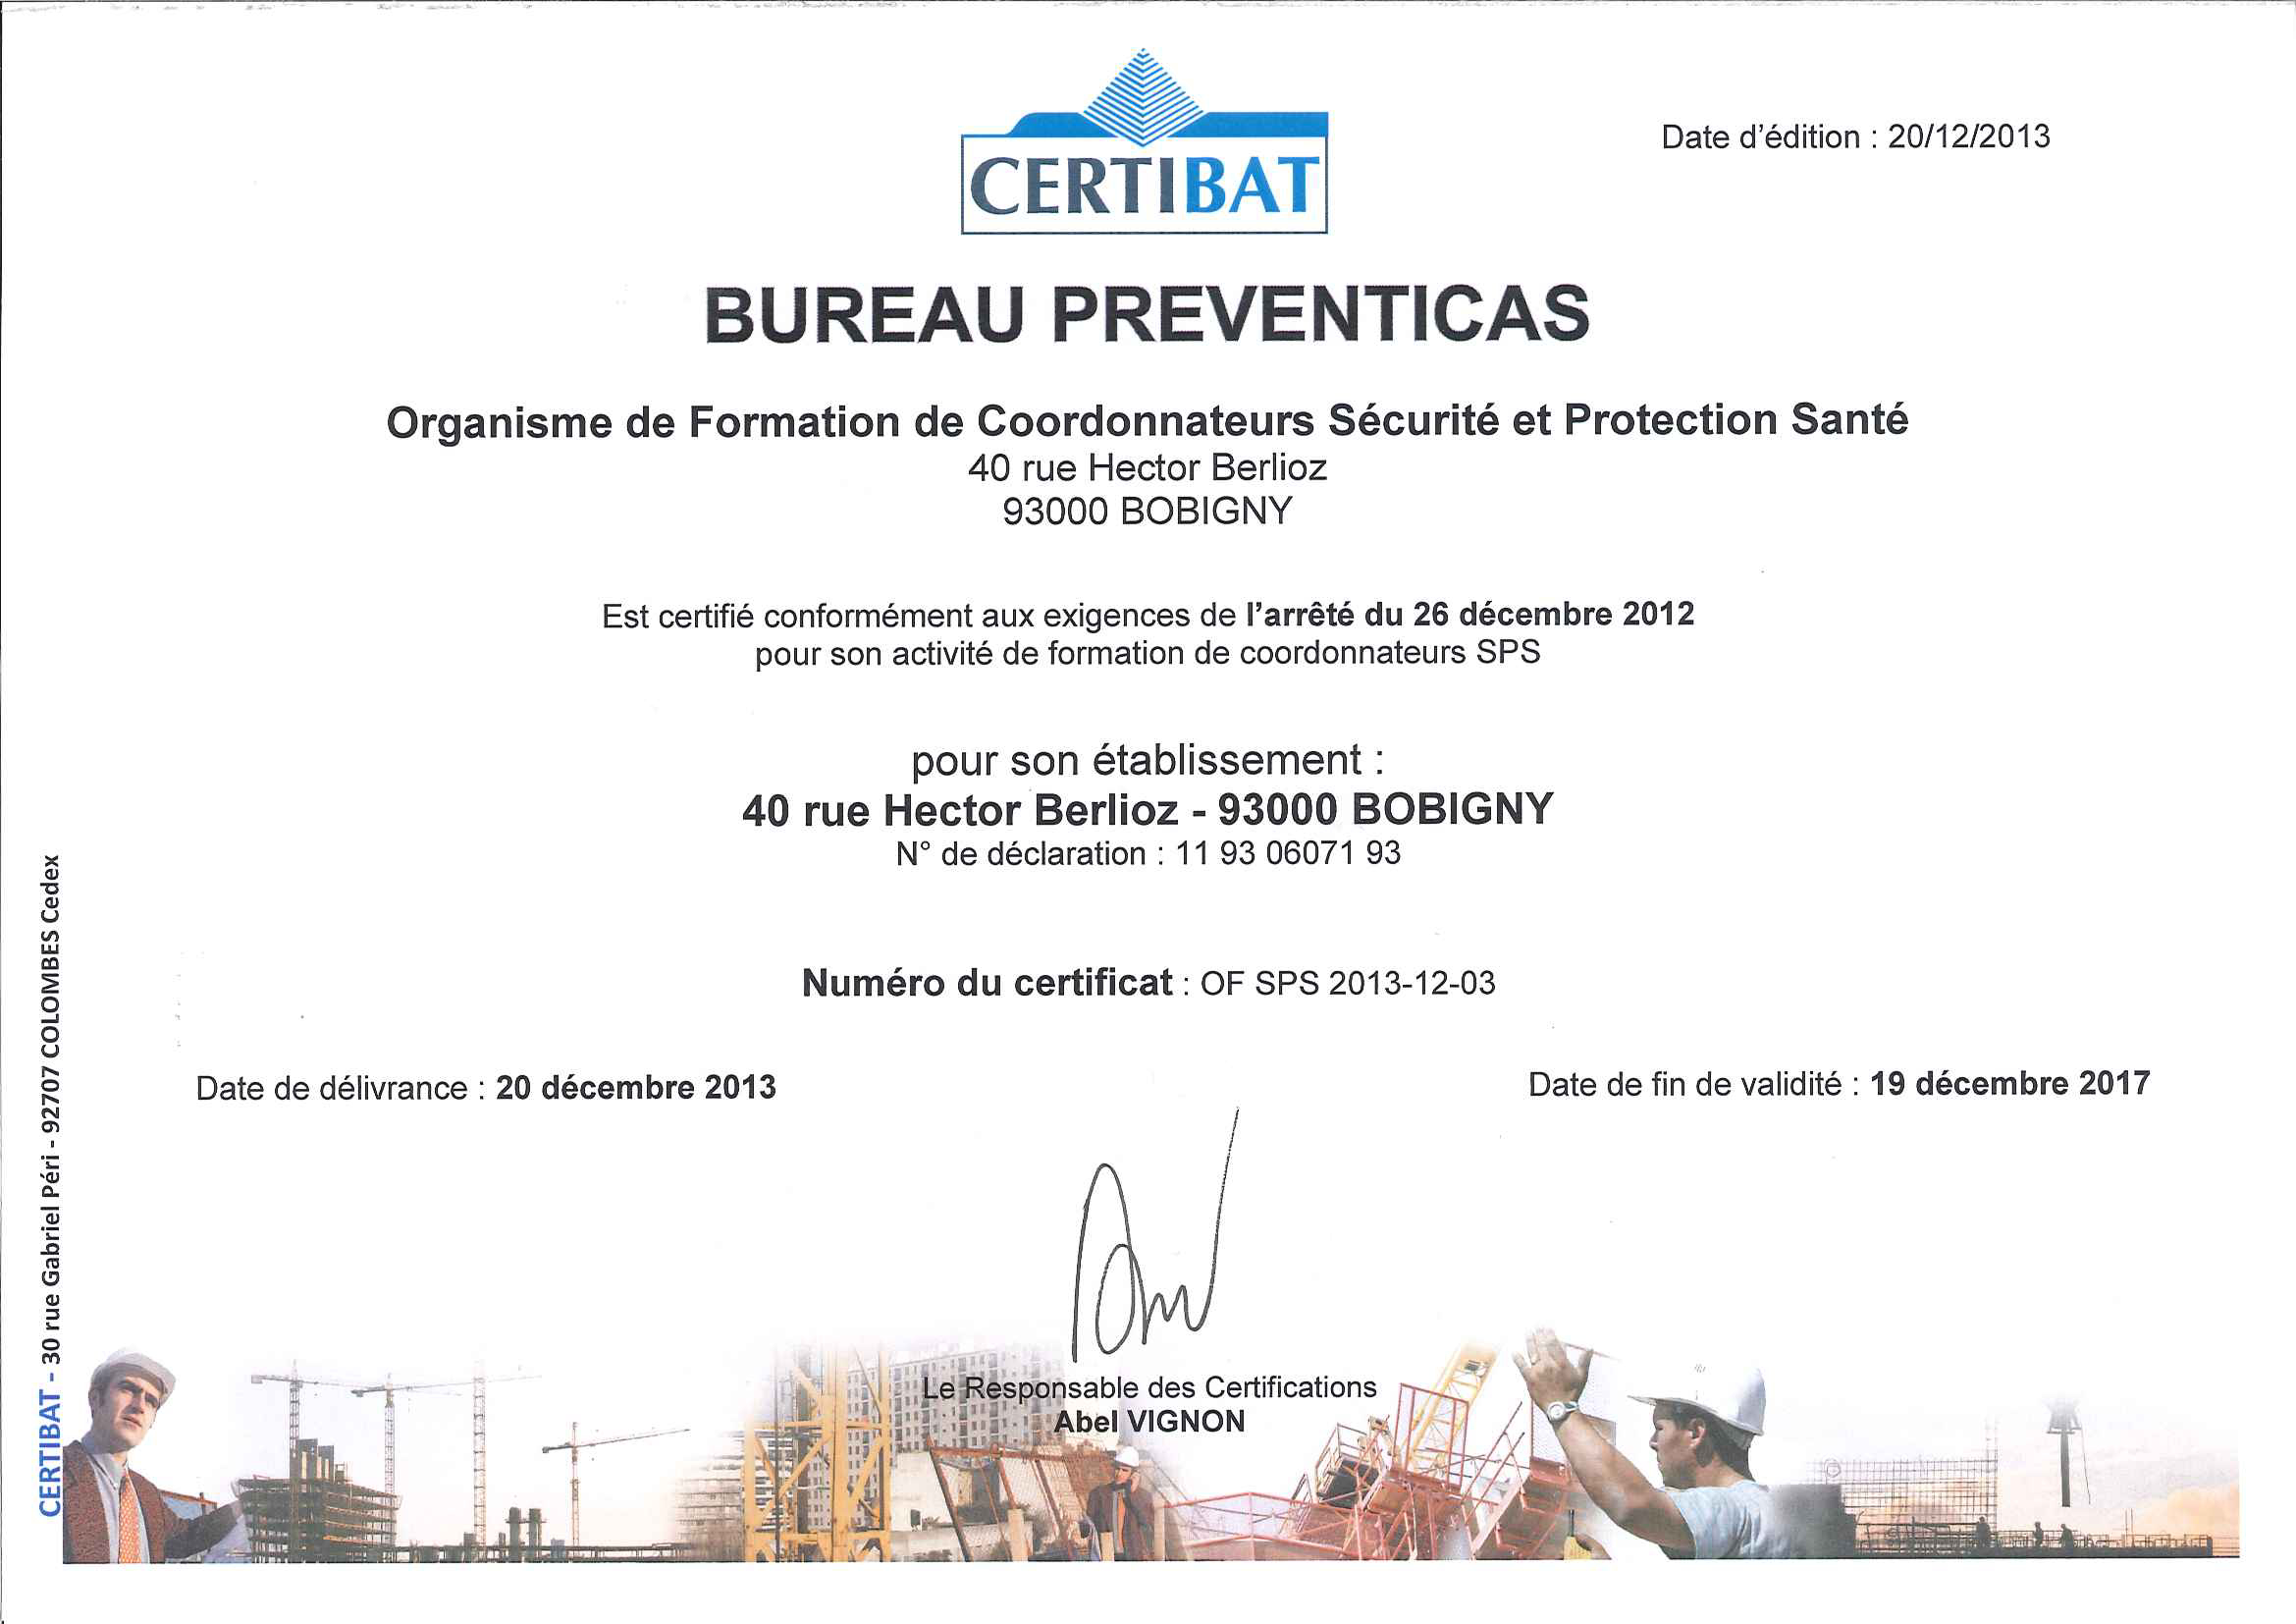 Certifications BureauPreventicas